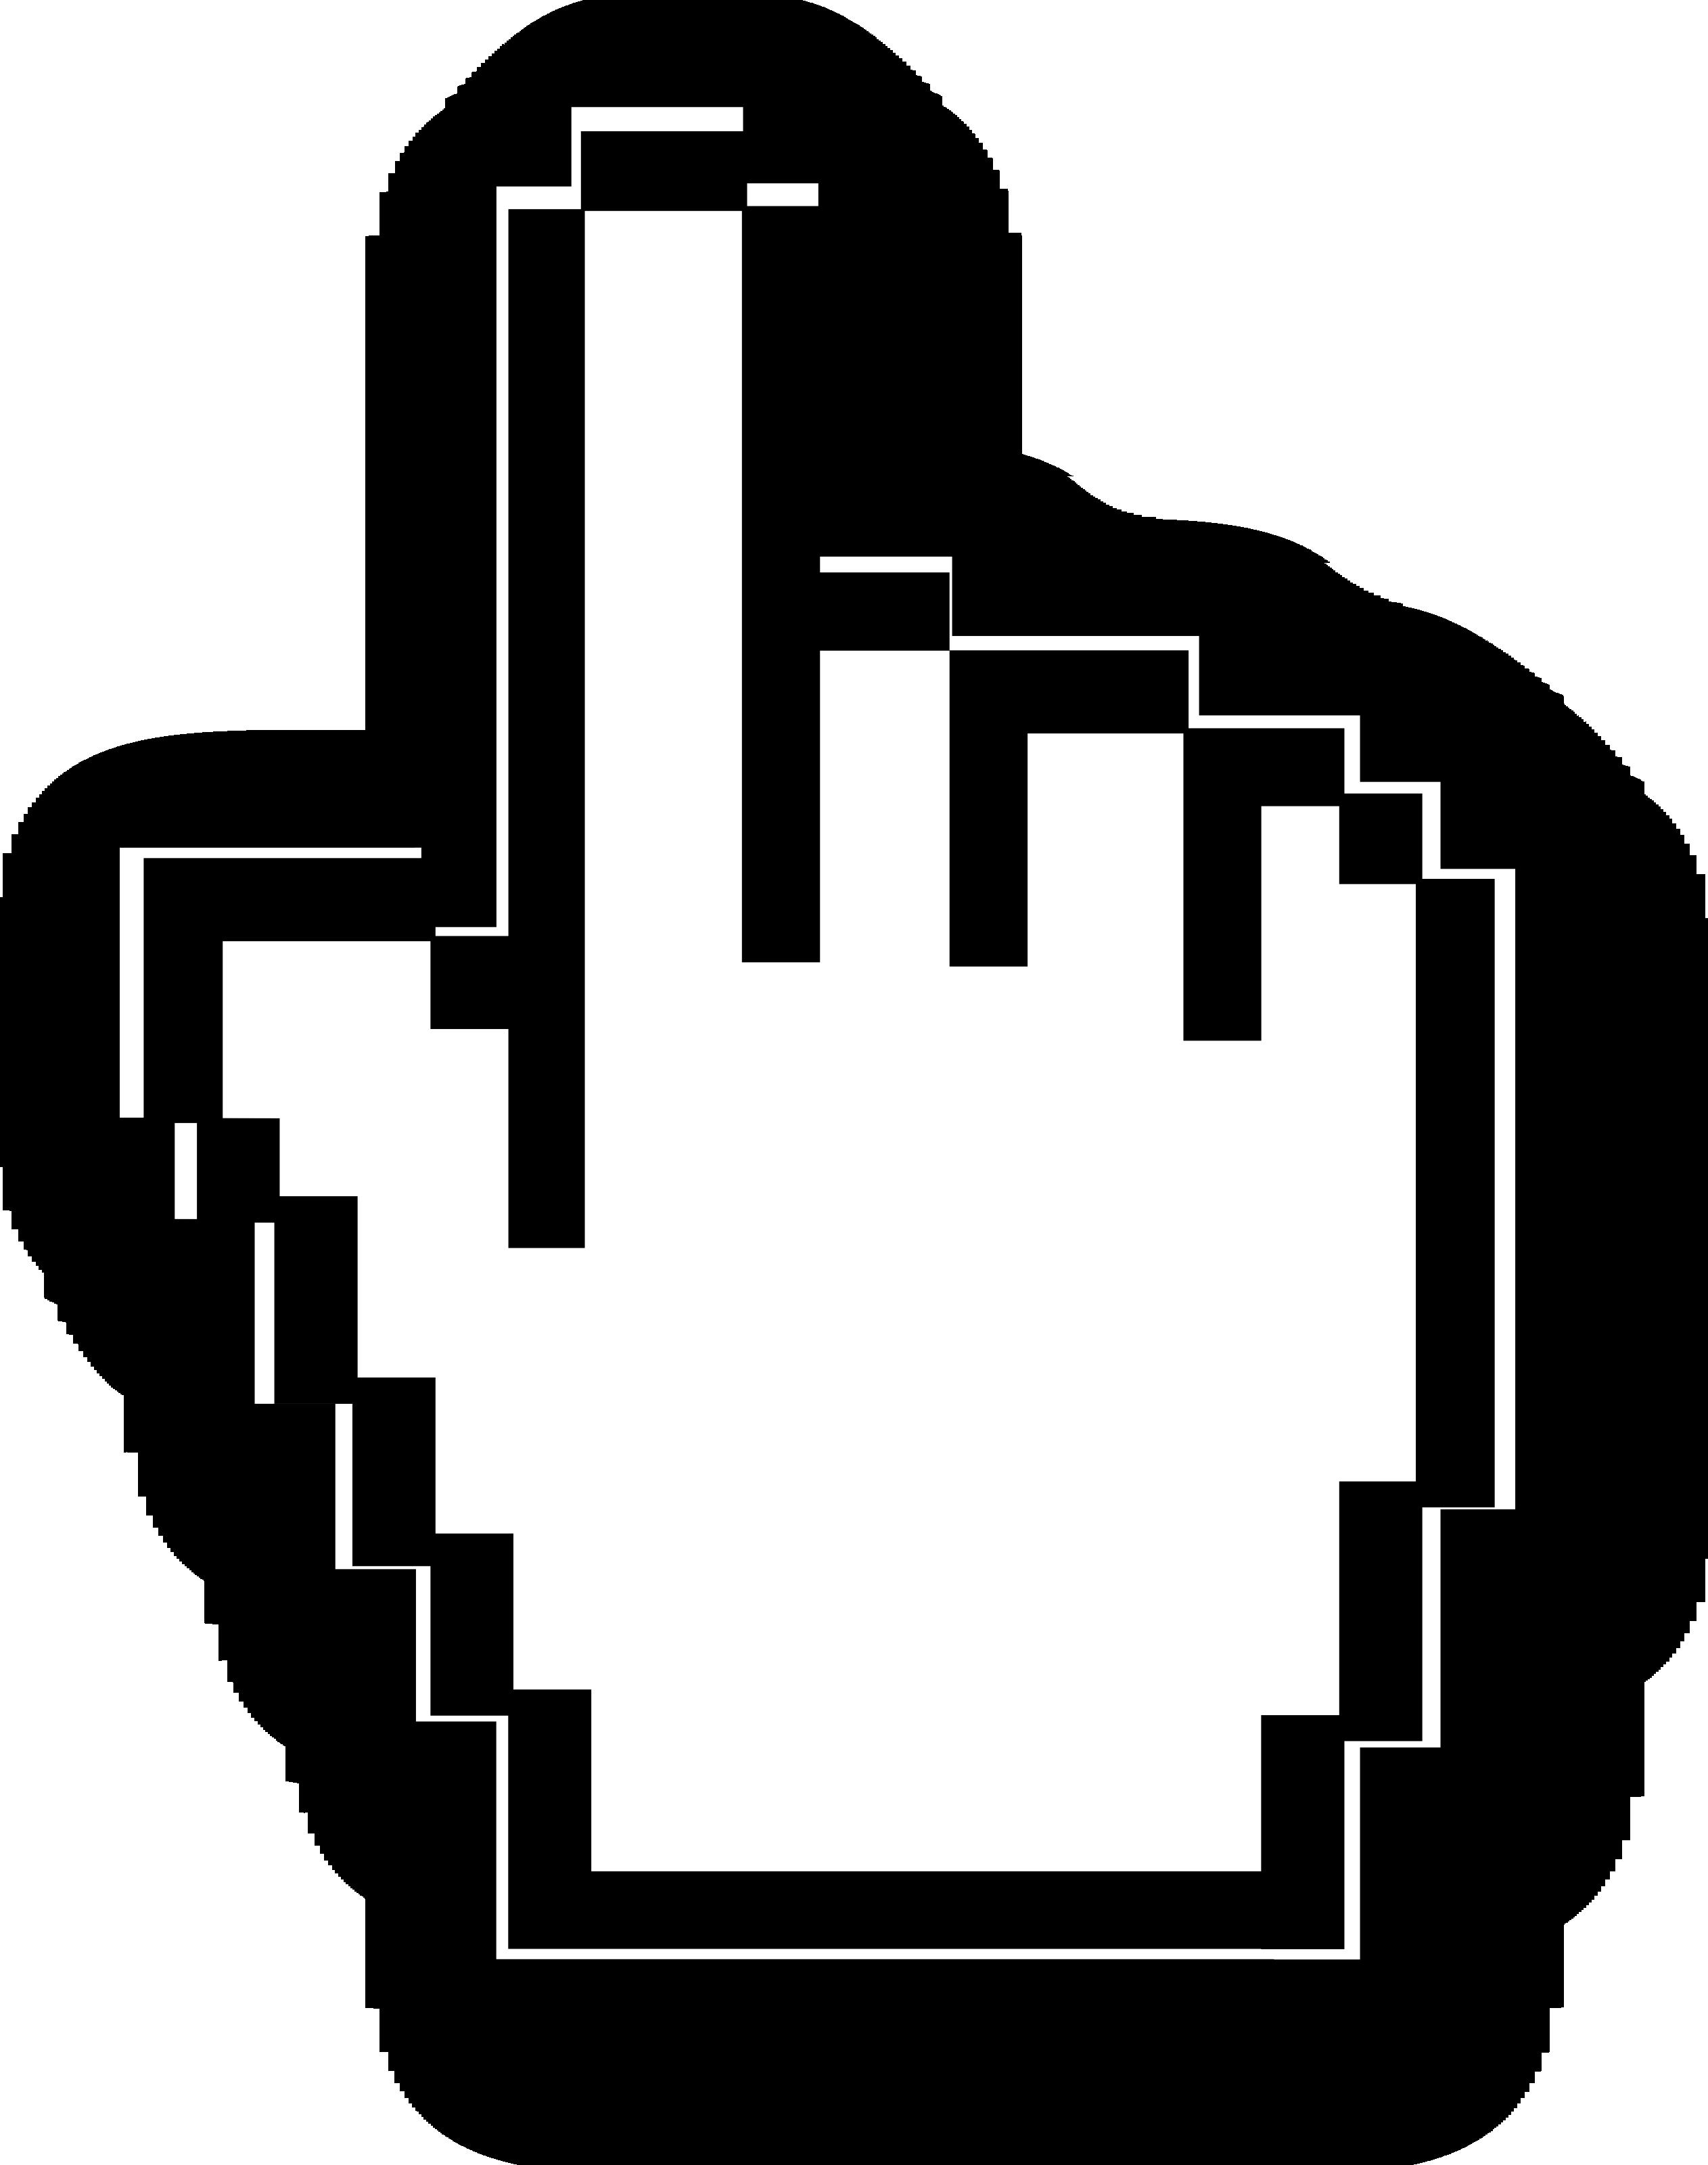 Arrow Black icon PNG Free